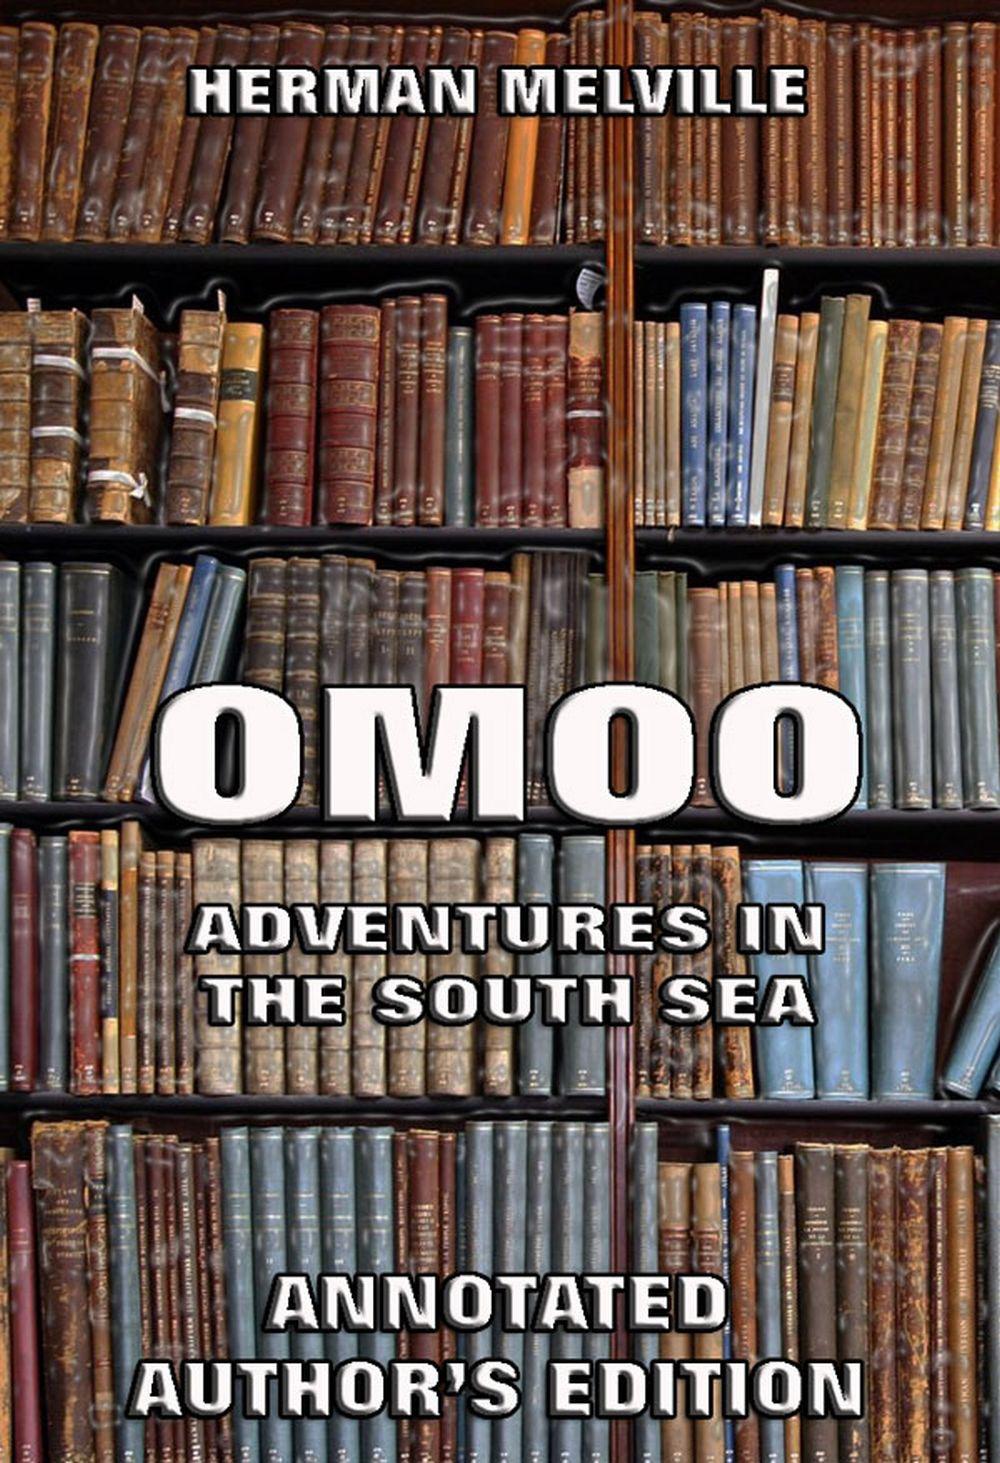 цена на Герман Мелвилл Omoo: Adventures in the South Seas